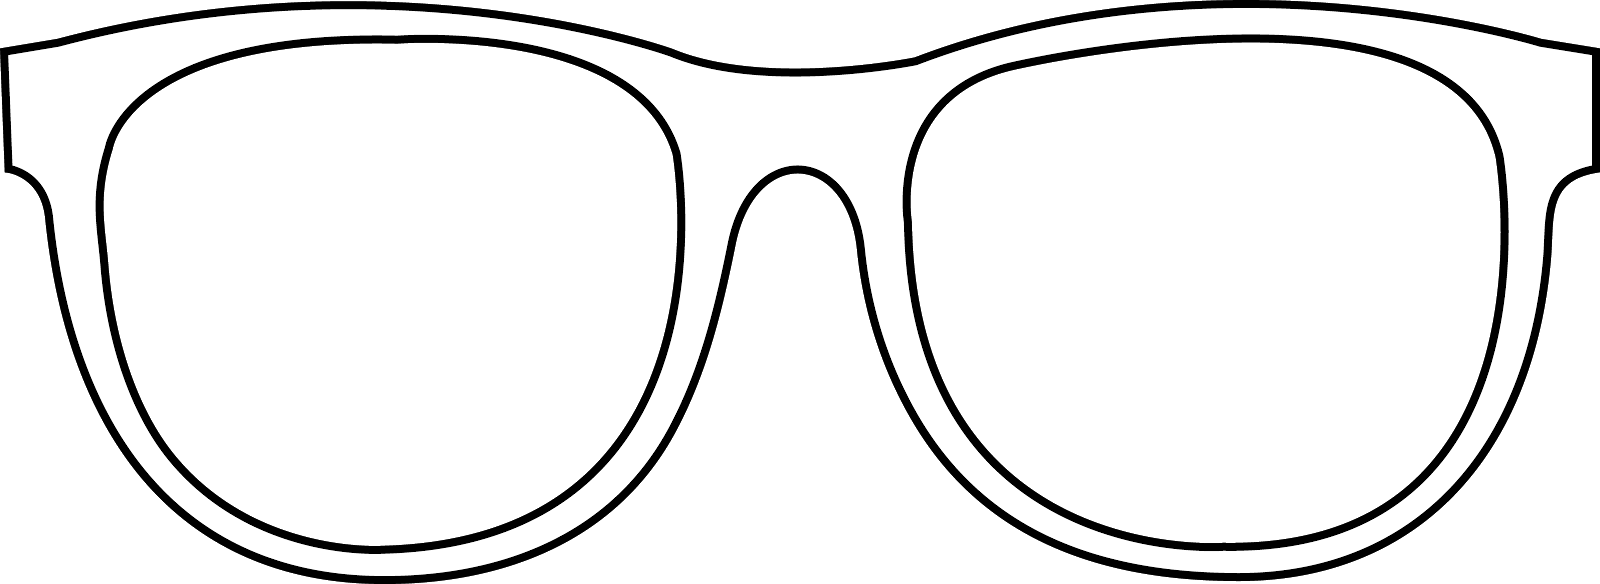 Sunglasses Outline Clip Art   Free clip art, Coloring ...